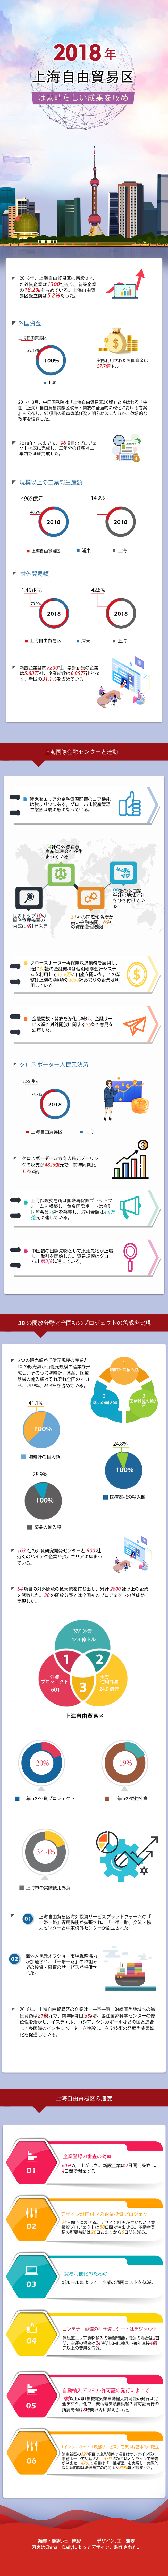 bwin.tv自贸区01_日语(1).jpg